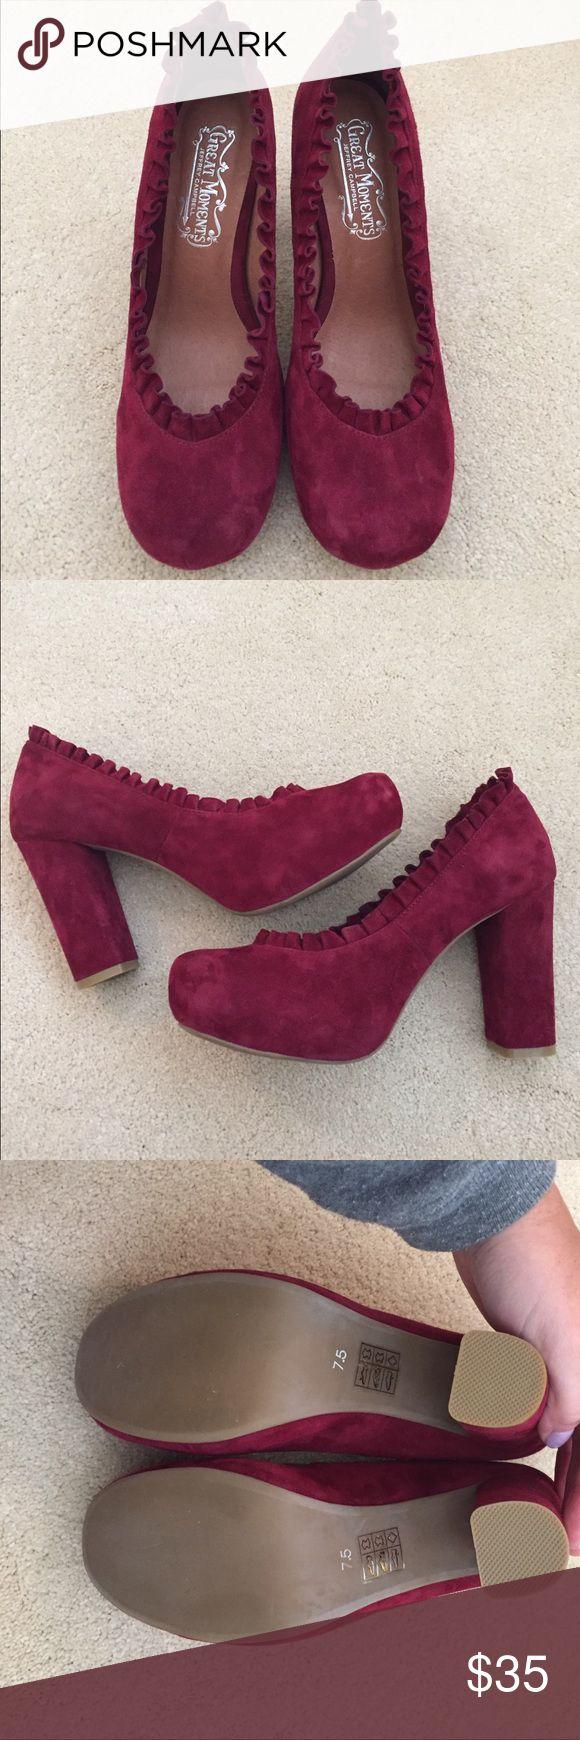 Beautiful suede maroon pumps NEVER WORN Jeffrey Campbell suede pumps Jeffrey Campbell Shoes Heels